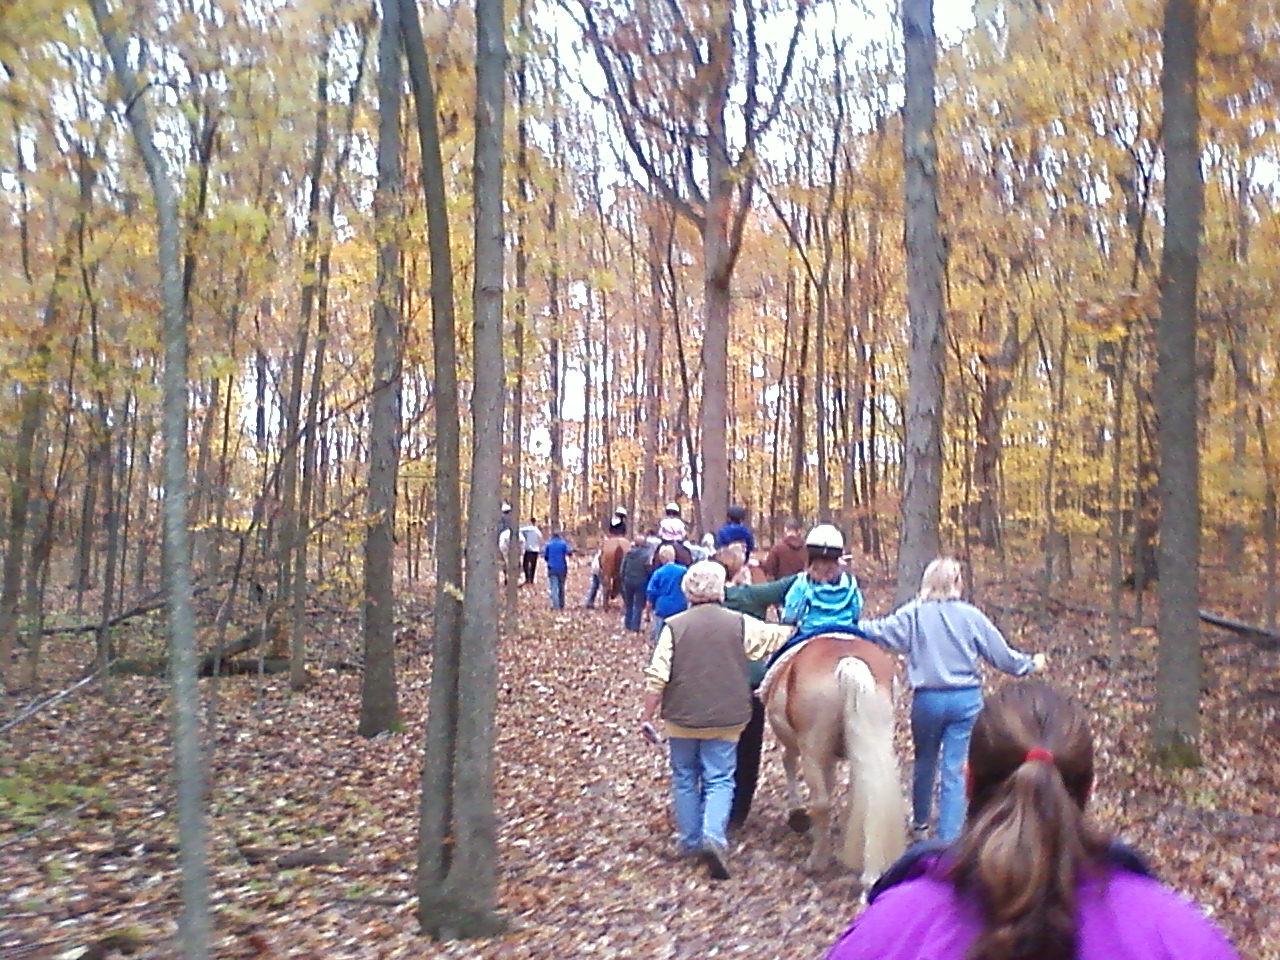 Trail ride 10-22-09 (3).jpg